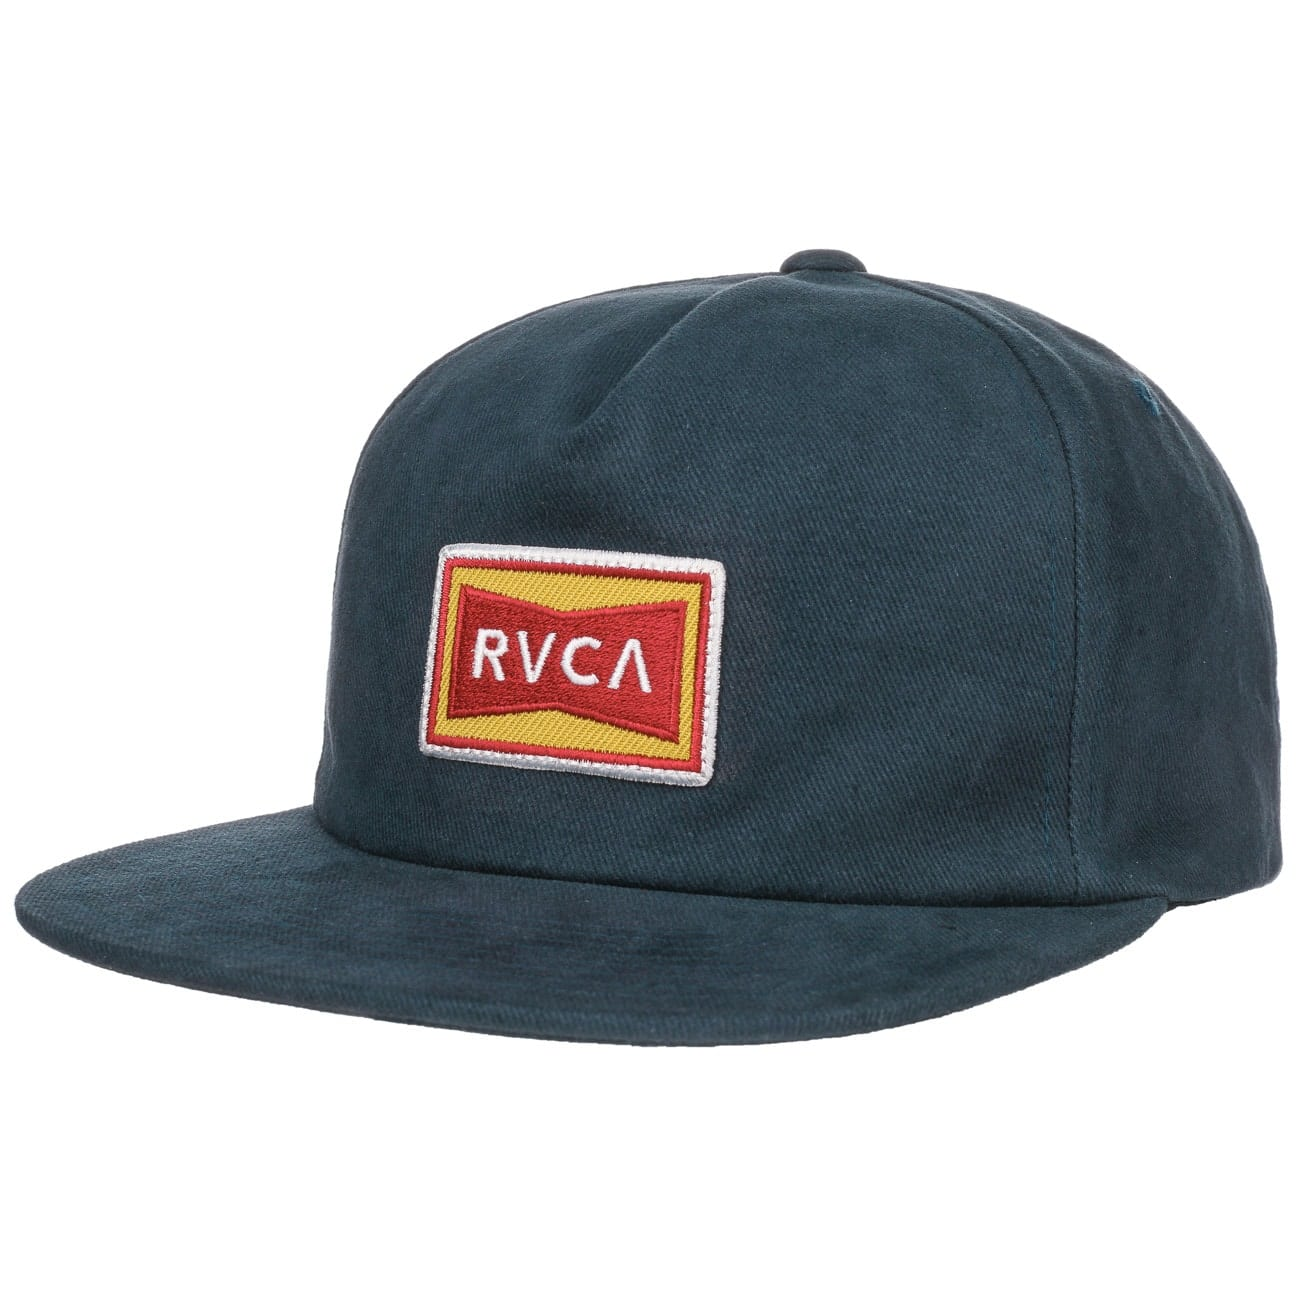 Gorra Snapback Cotton by RVCA